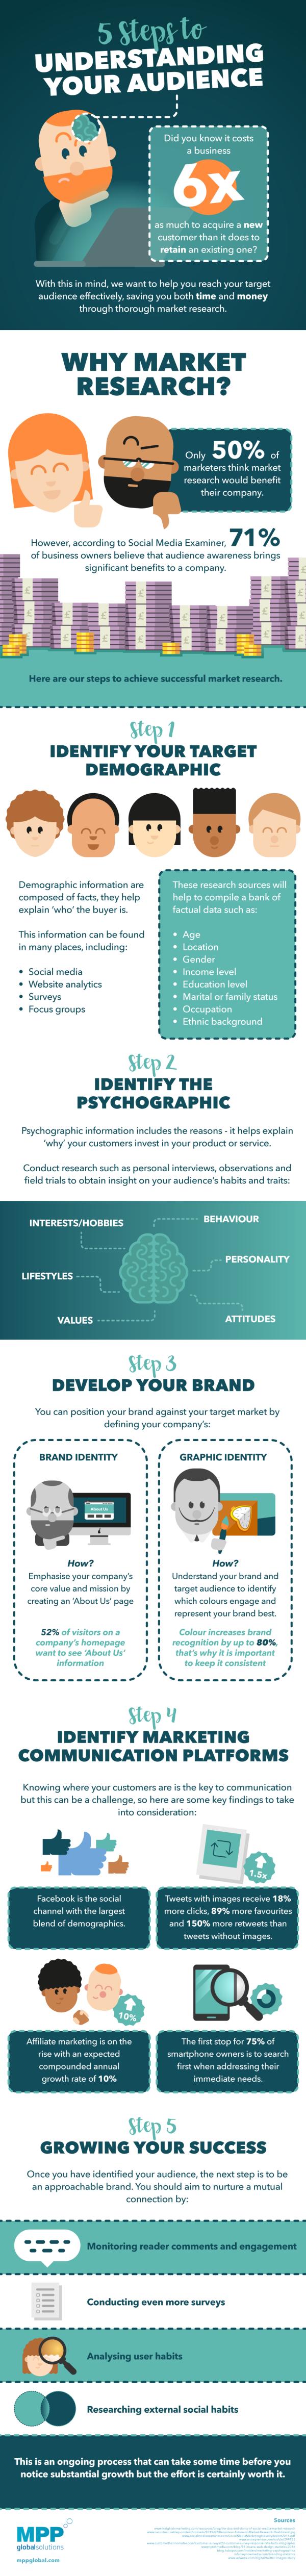 Infographic: Understanding Your Audience